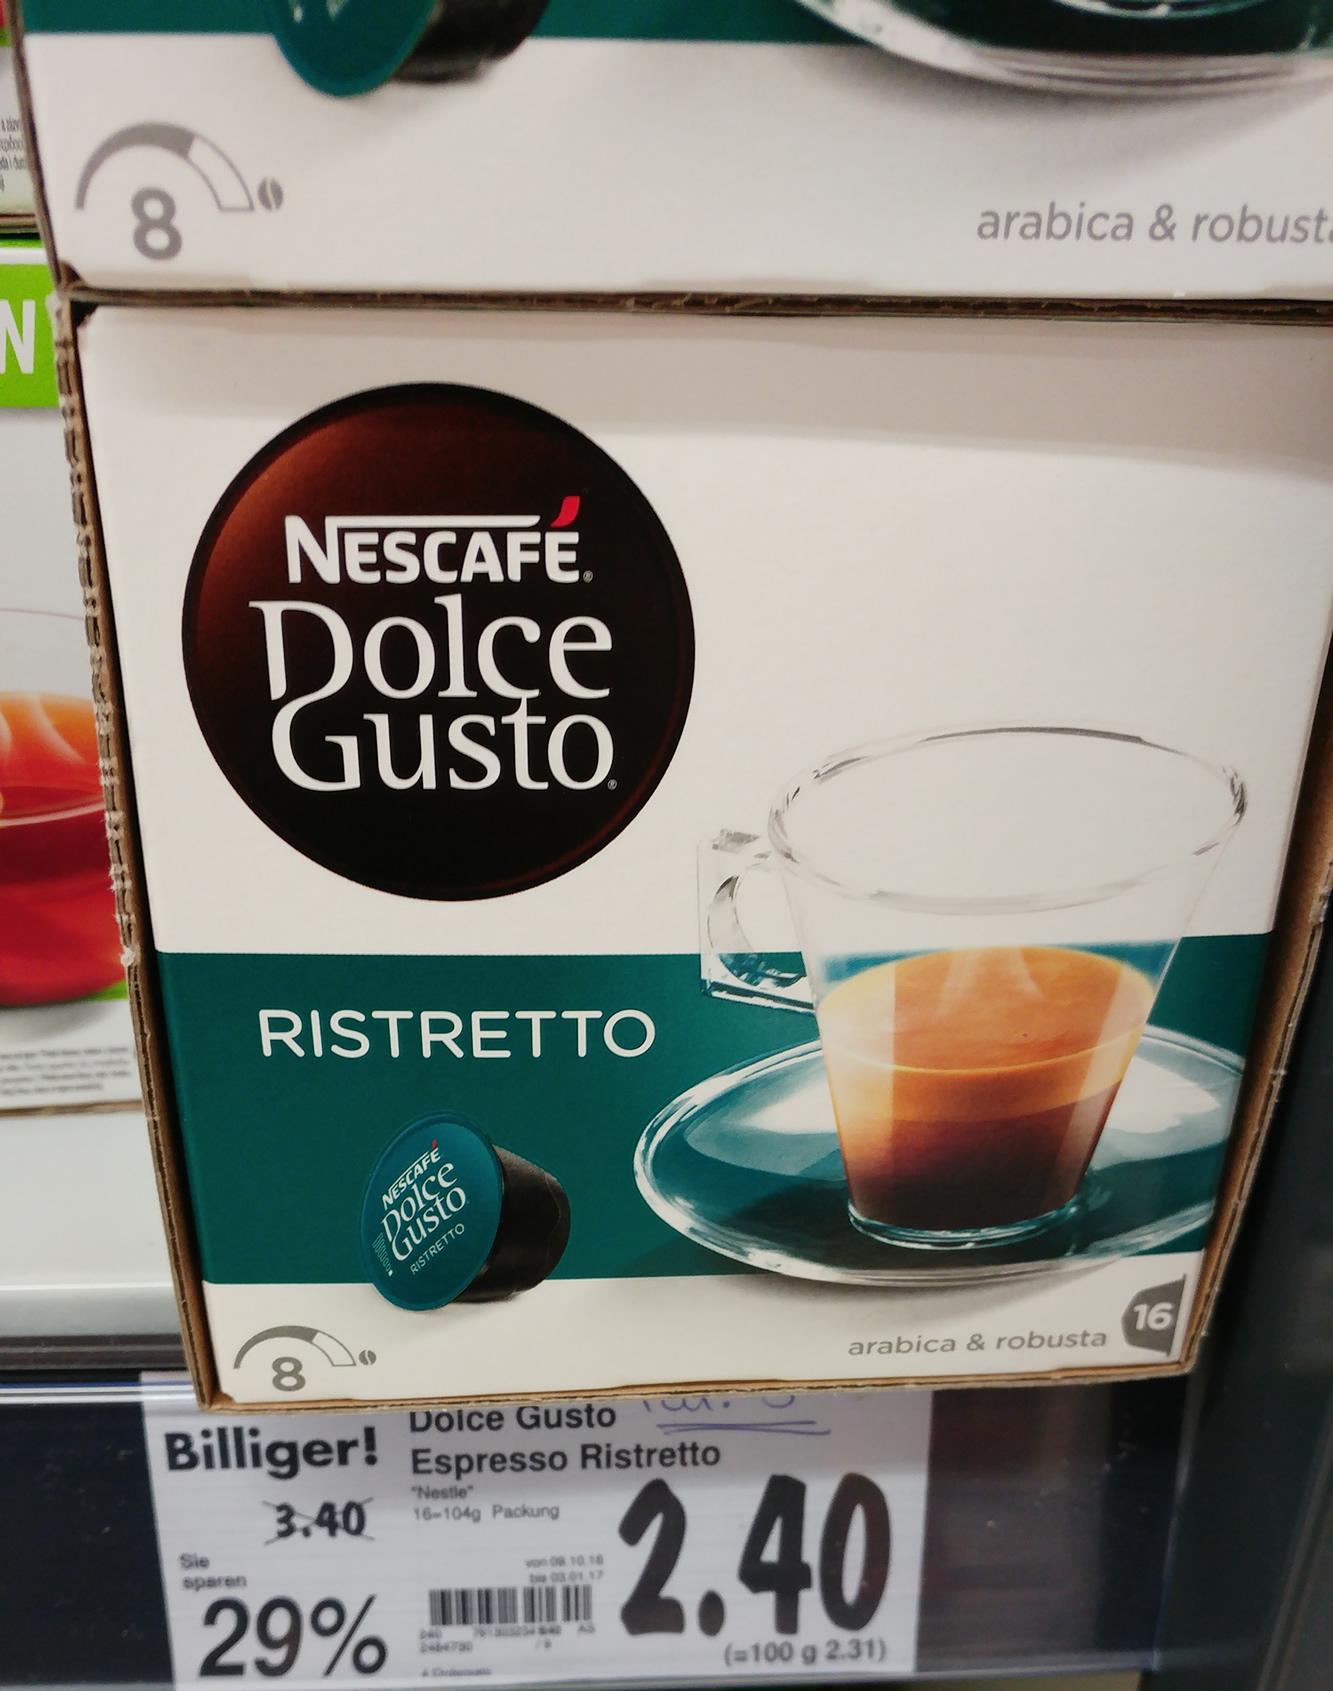 PREISFEHLER? :D [Kaufland Lokal - Hx] Dolce Gusto Ristretto Espresso für 2,40 Euro